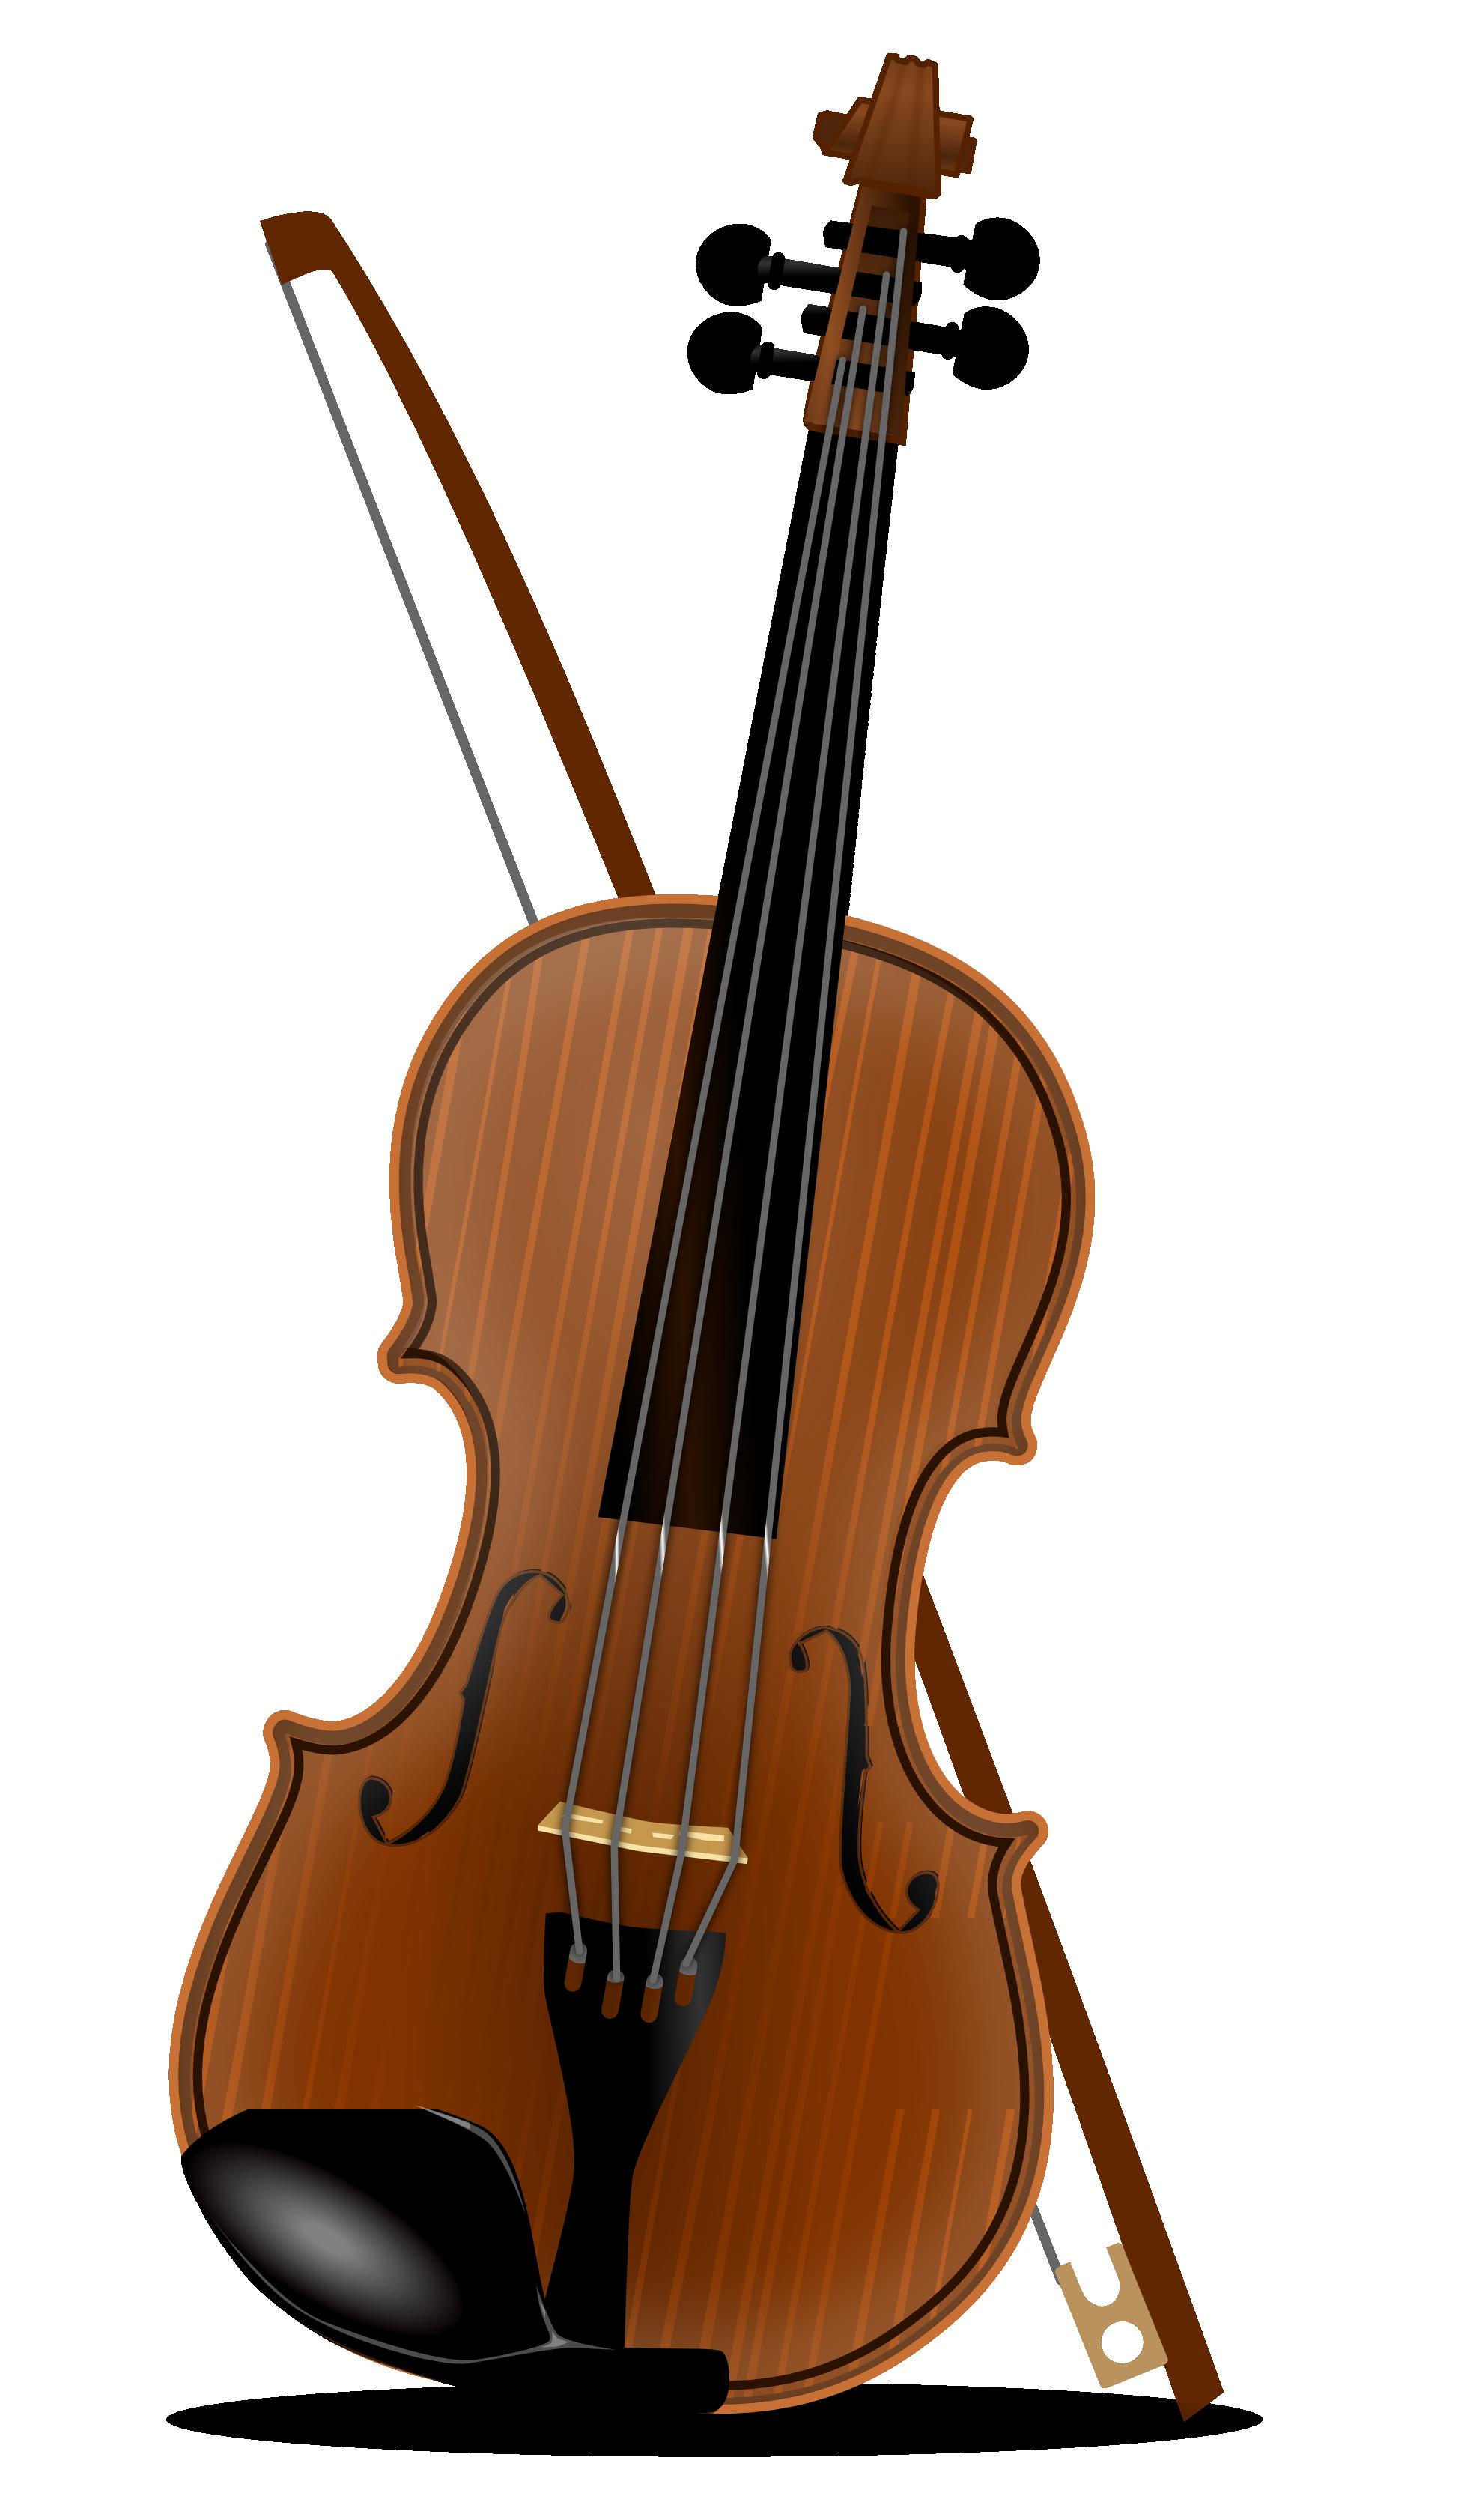 svg transparent stock Violin clipart. Clip art free panda